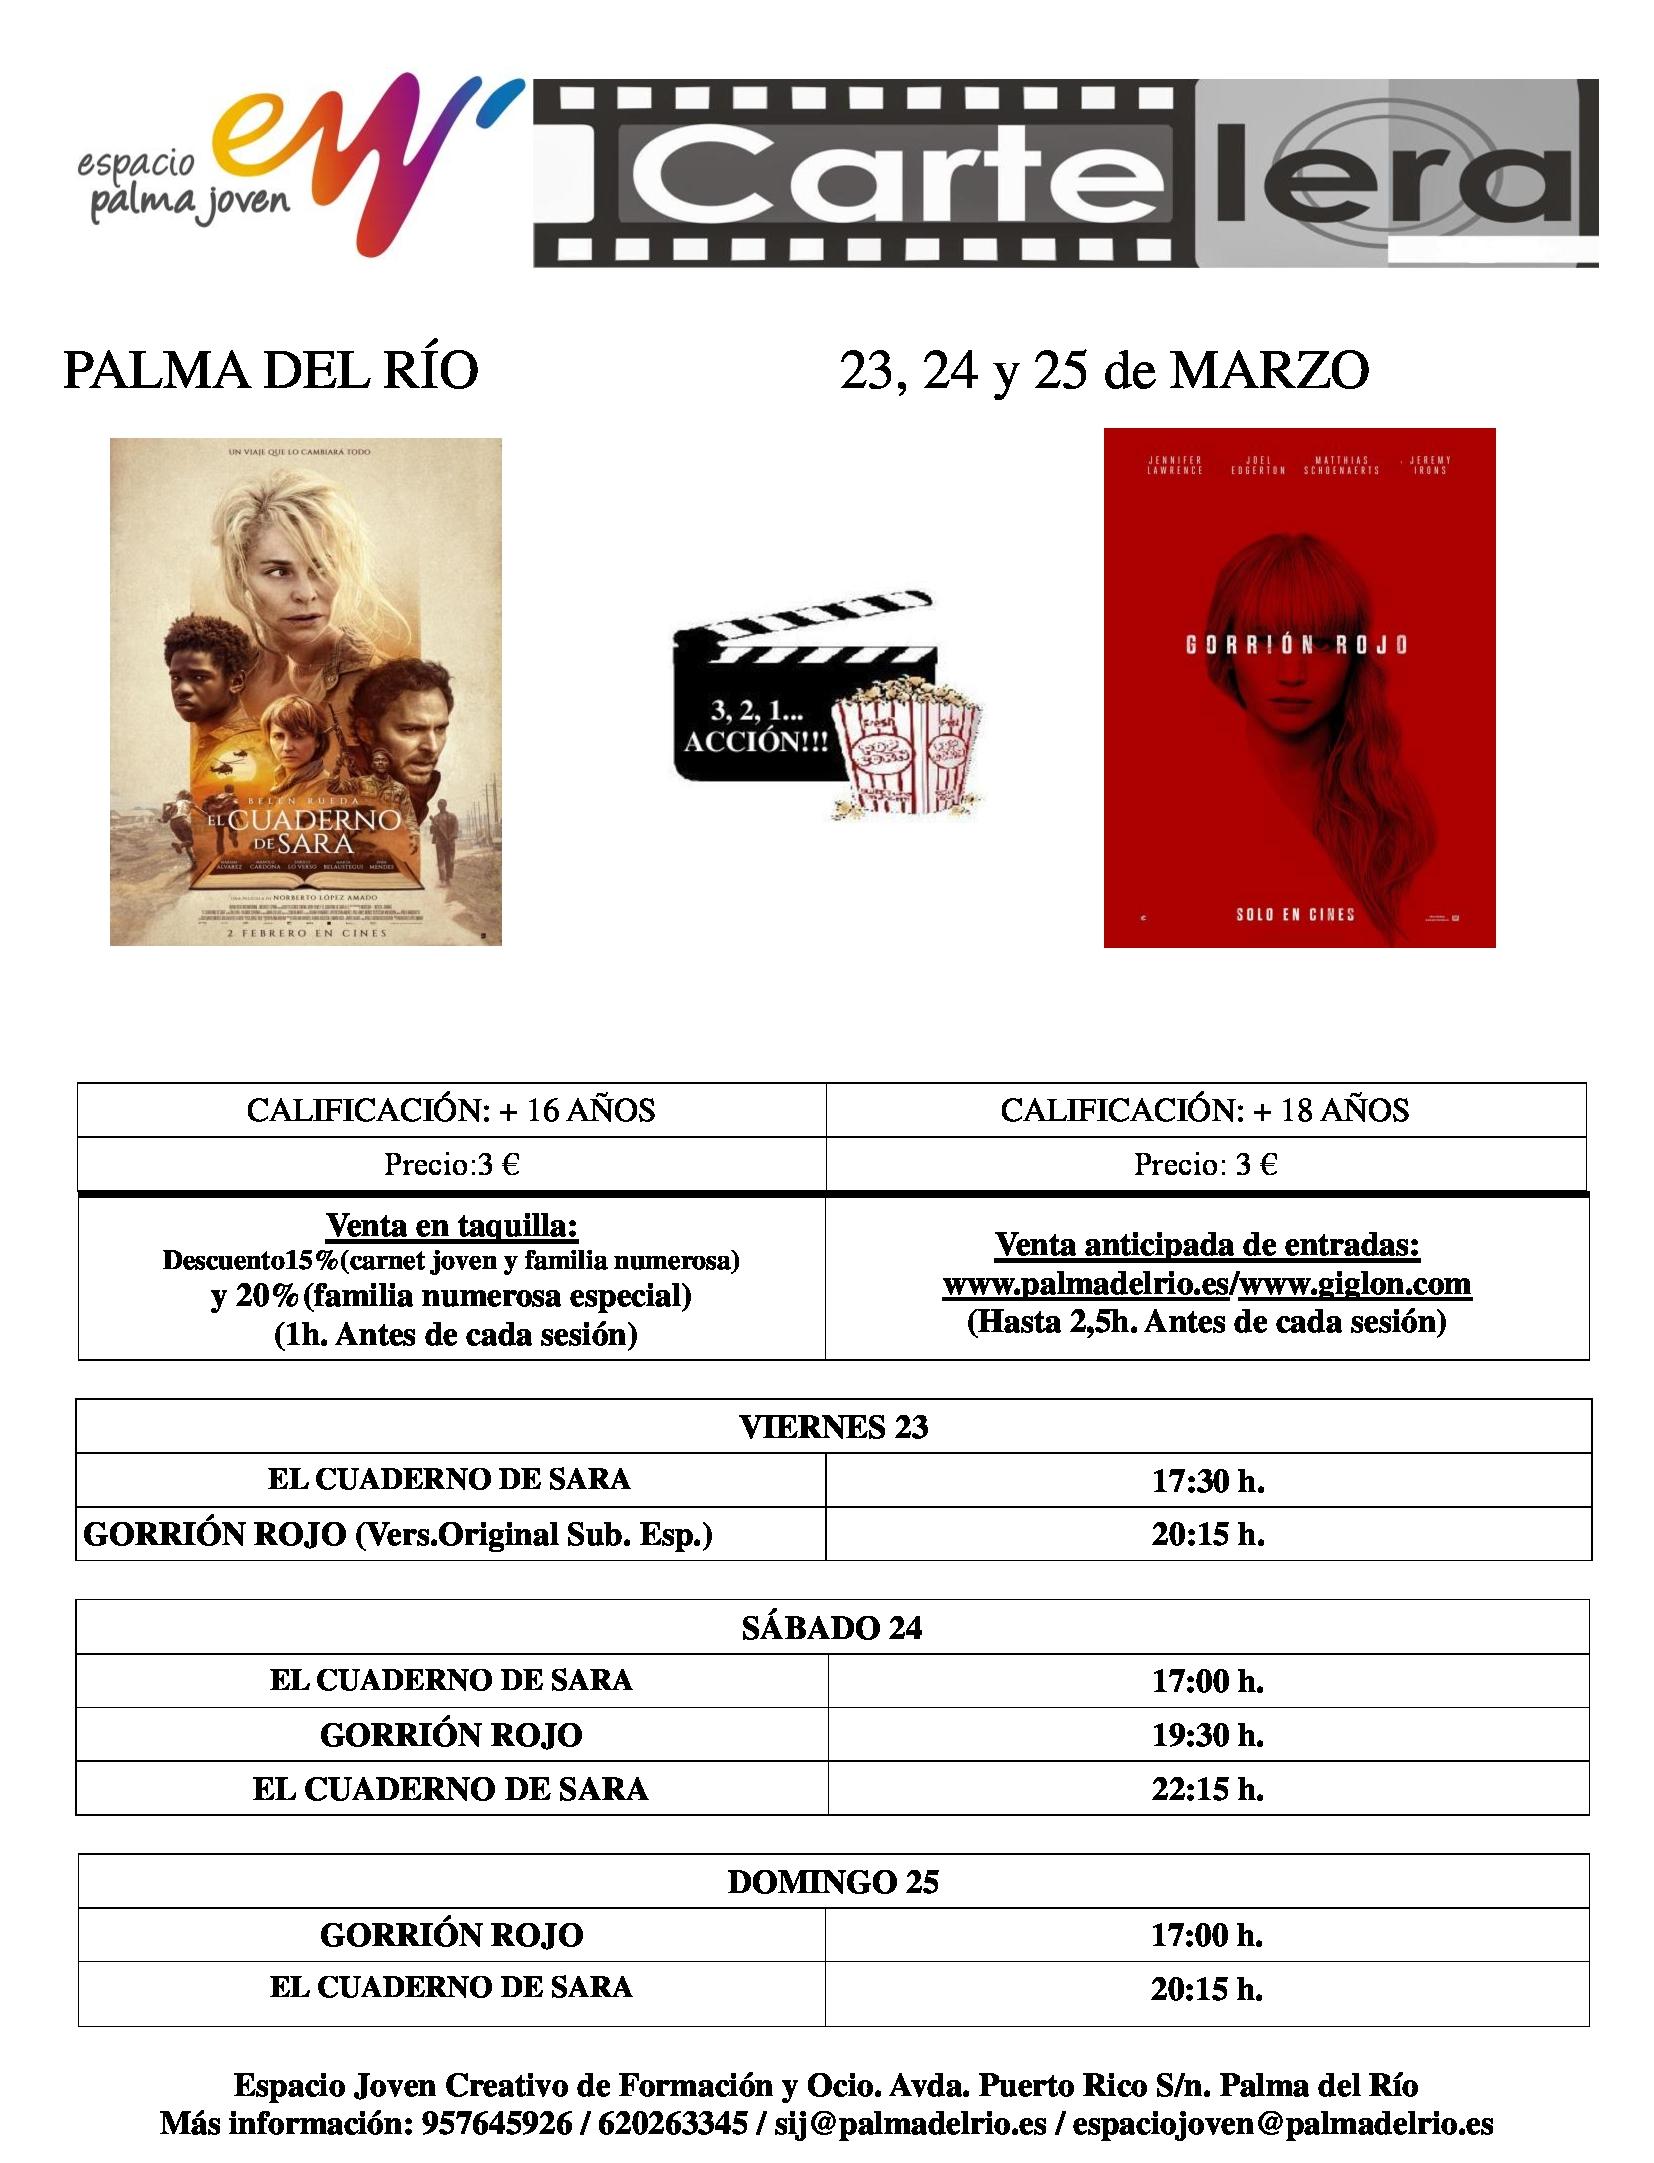 https://www.palmadelrio.es/sites/default/files/cartelera_23.24.25_marzo_2018.jpg